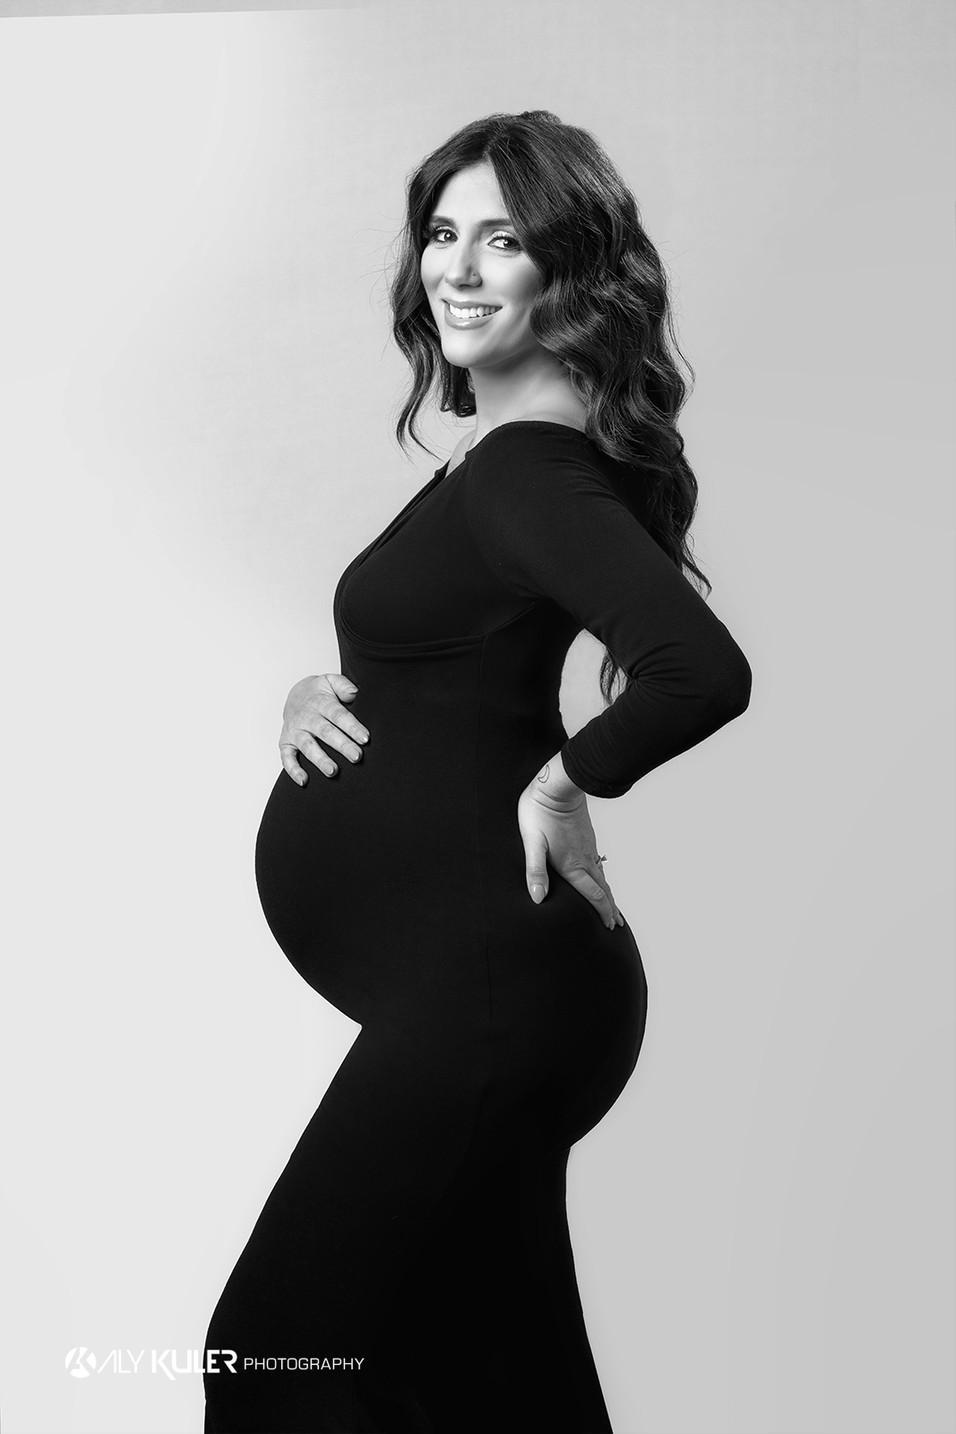 Maternity_photos_Aly_Kuler_3394.jpg